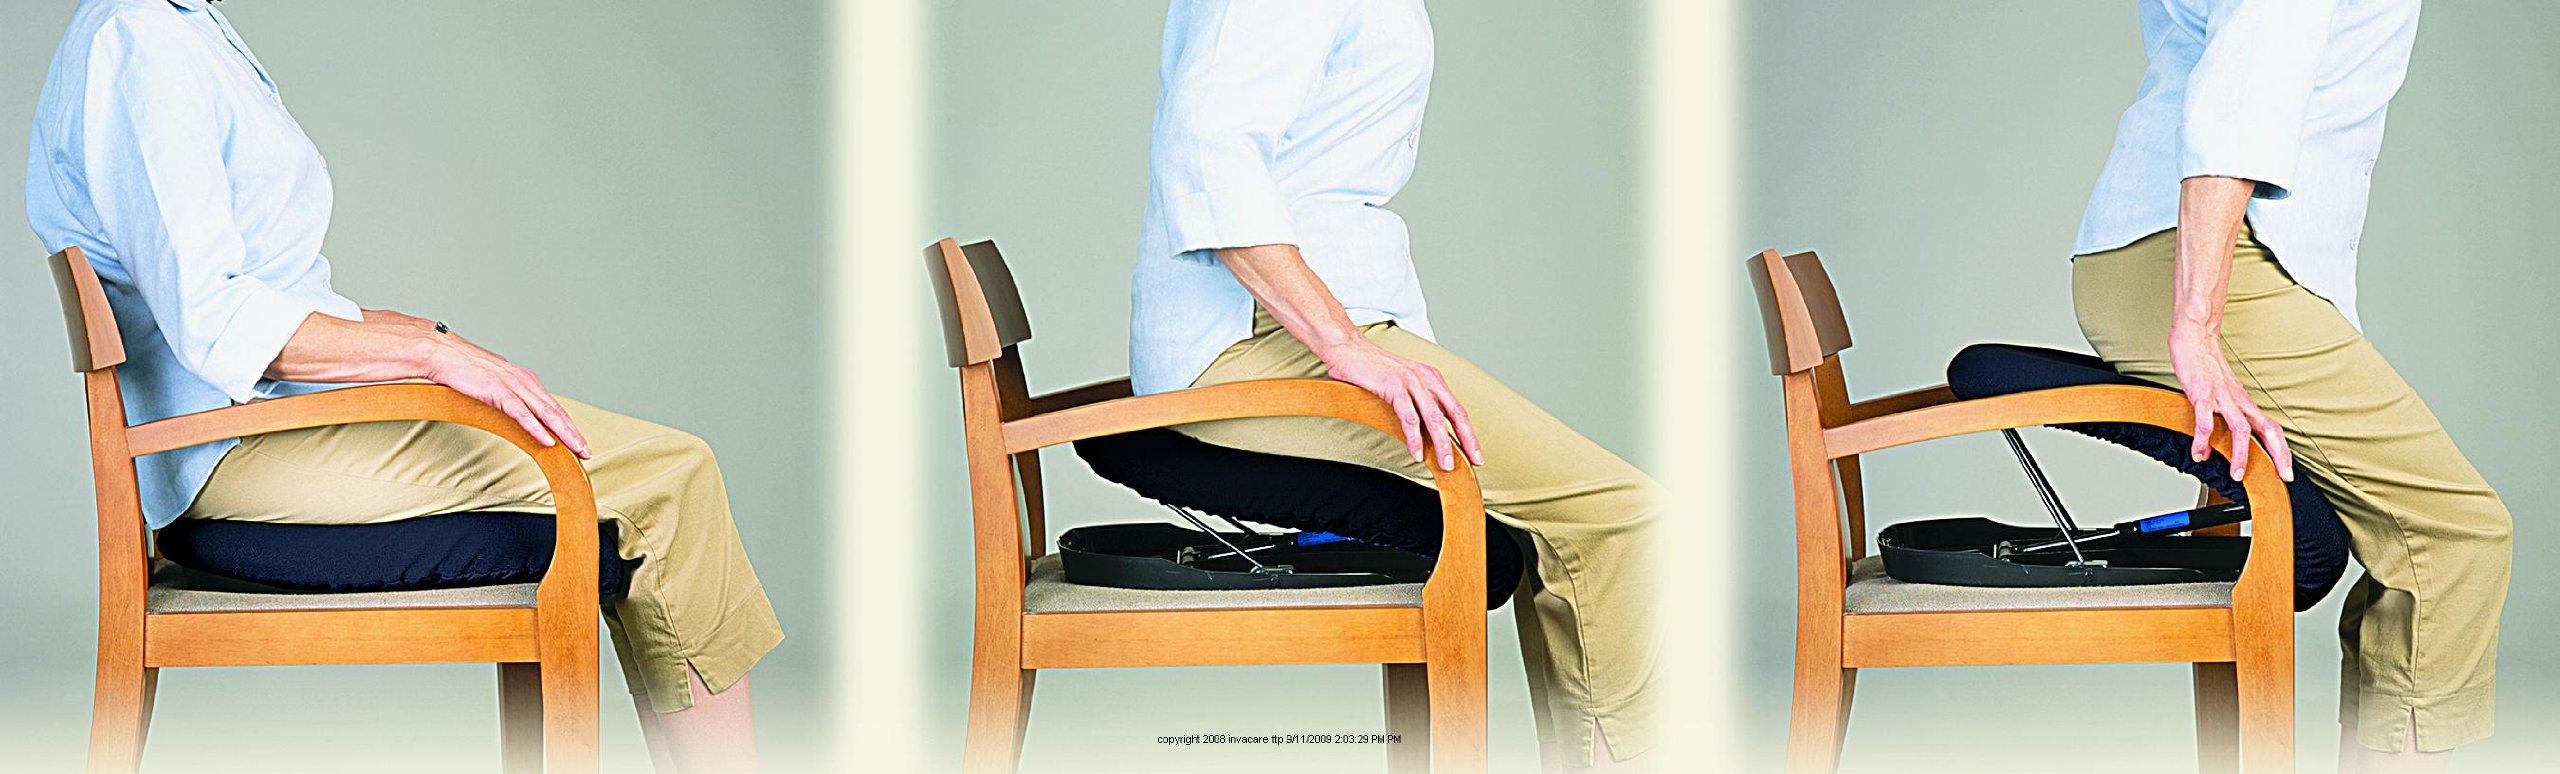 Uplift Seat Assist, Uplift Seat Assist 80-230Lbs, (1 EACH, 1 EACH)